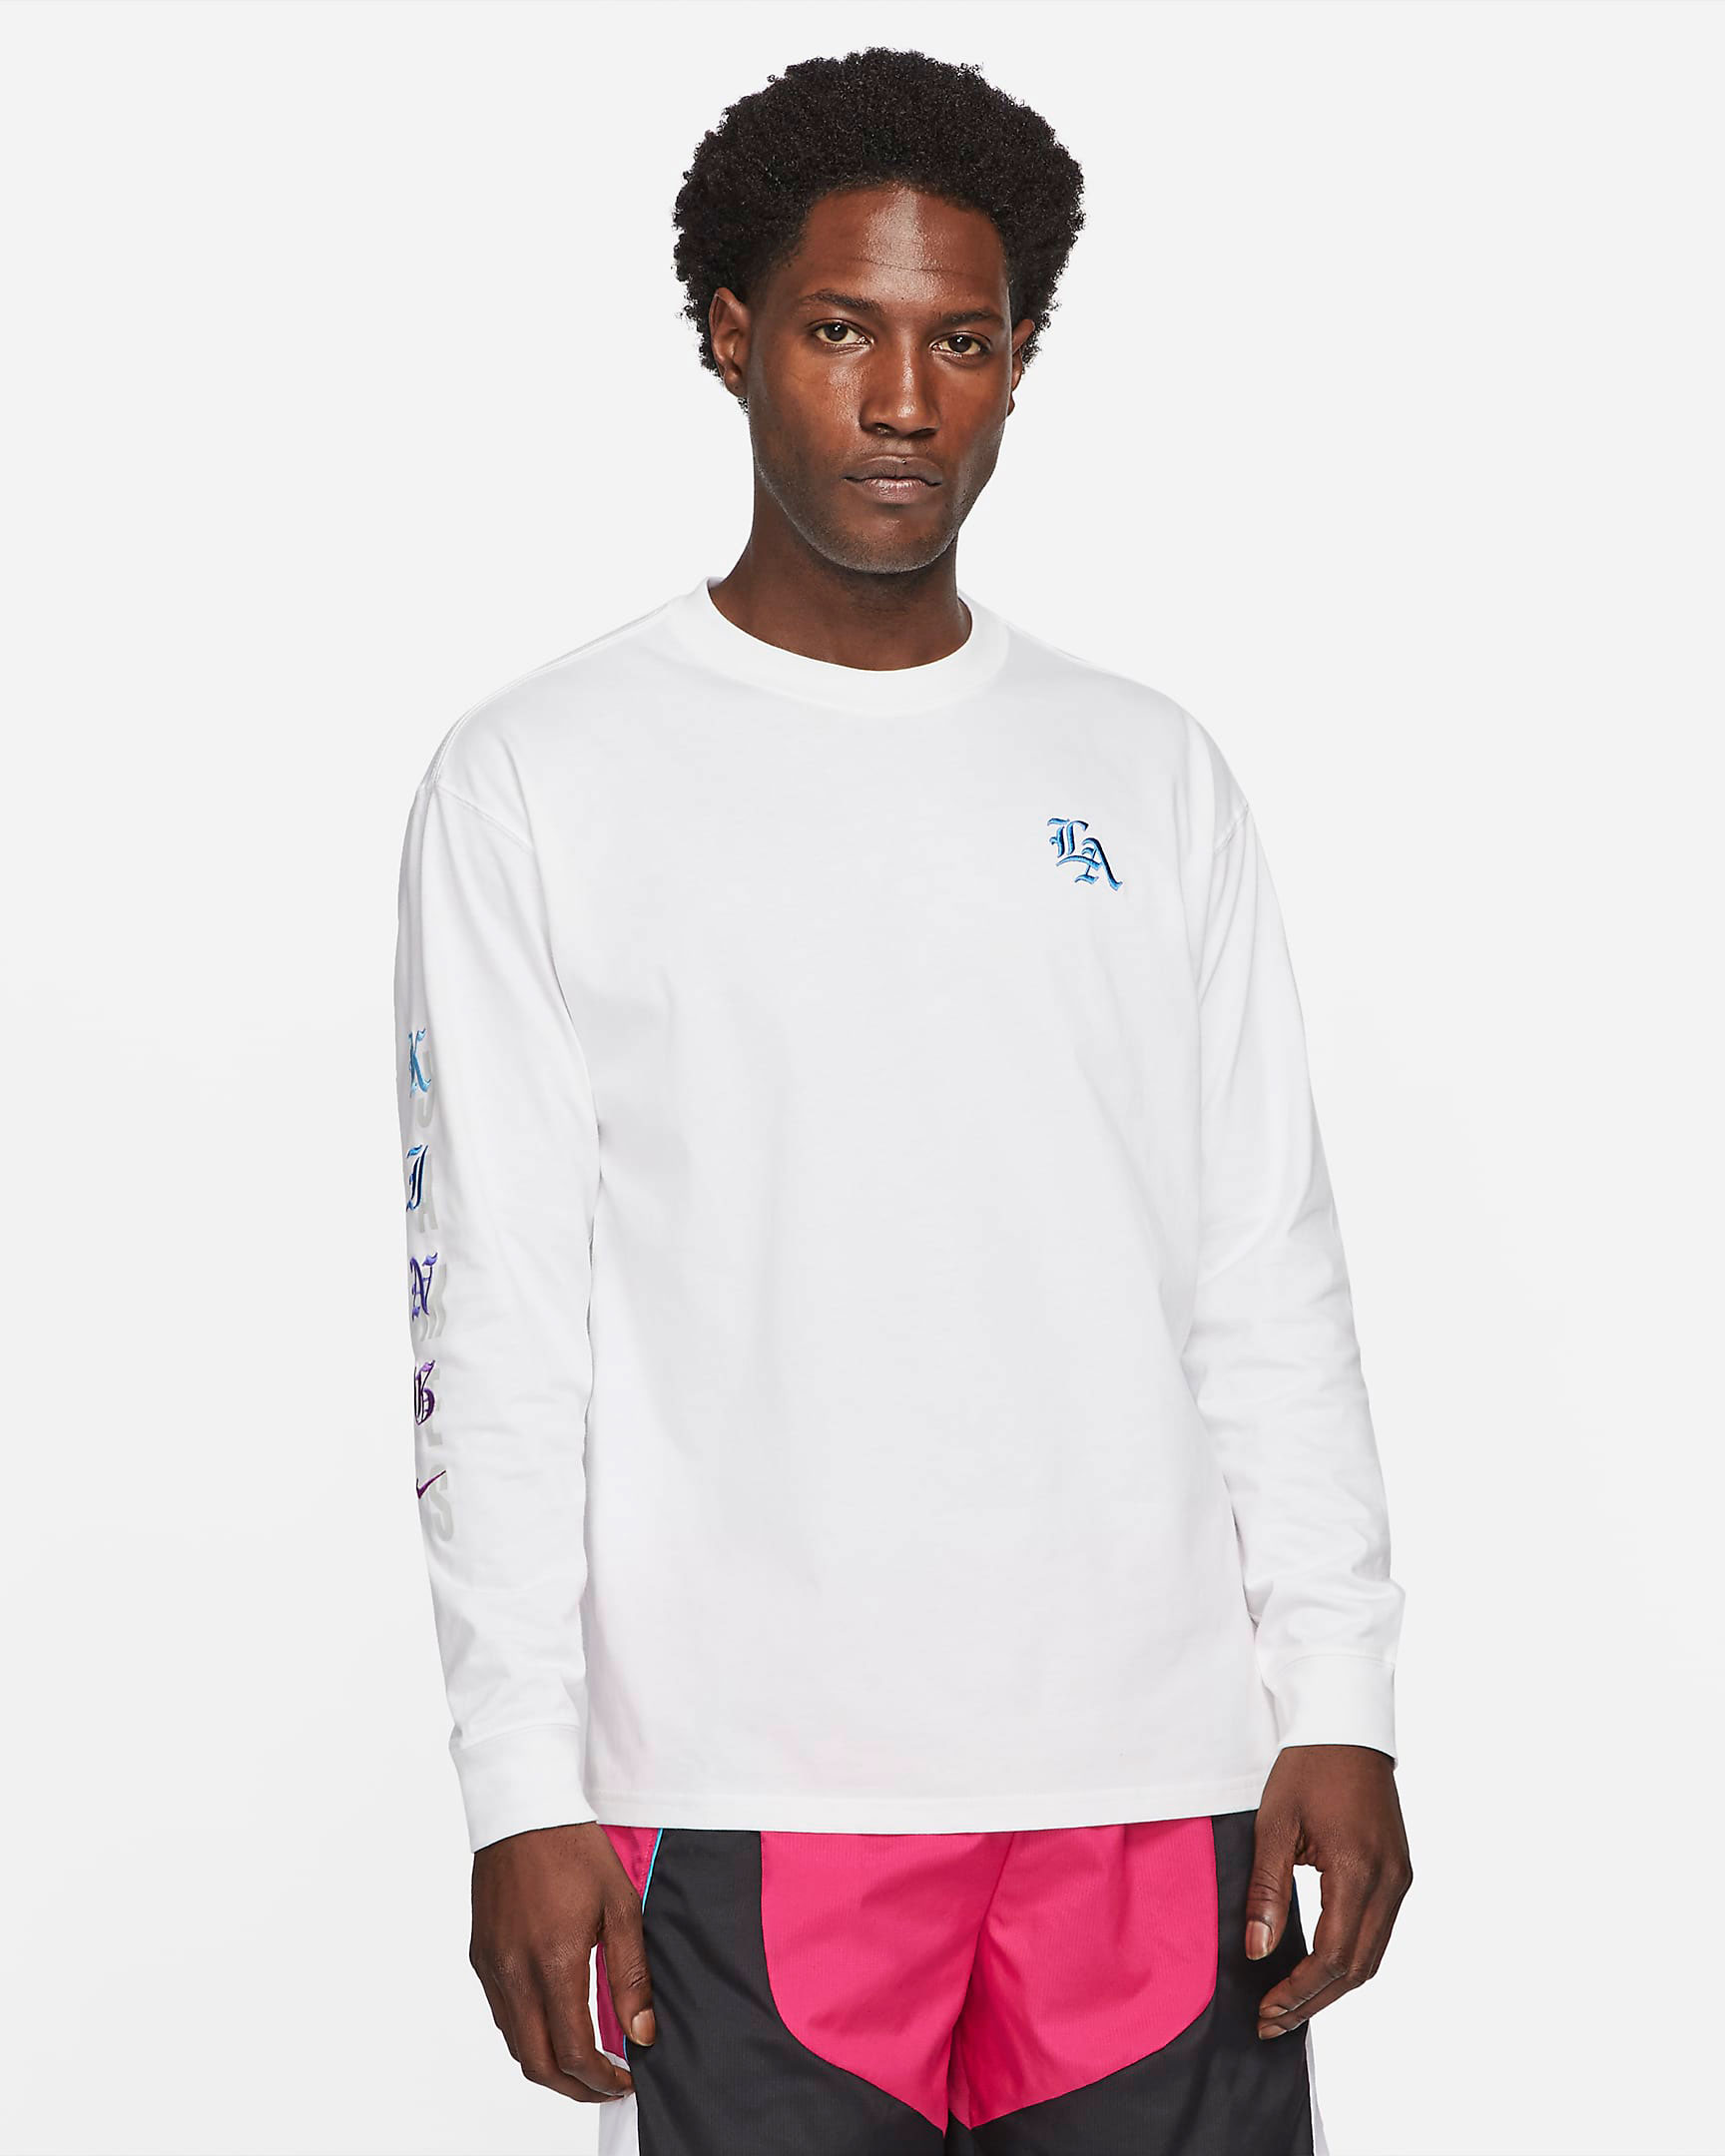 nike-lebron-18-multicolor-shirt-1